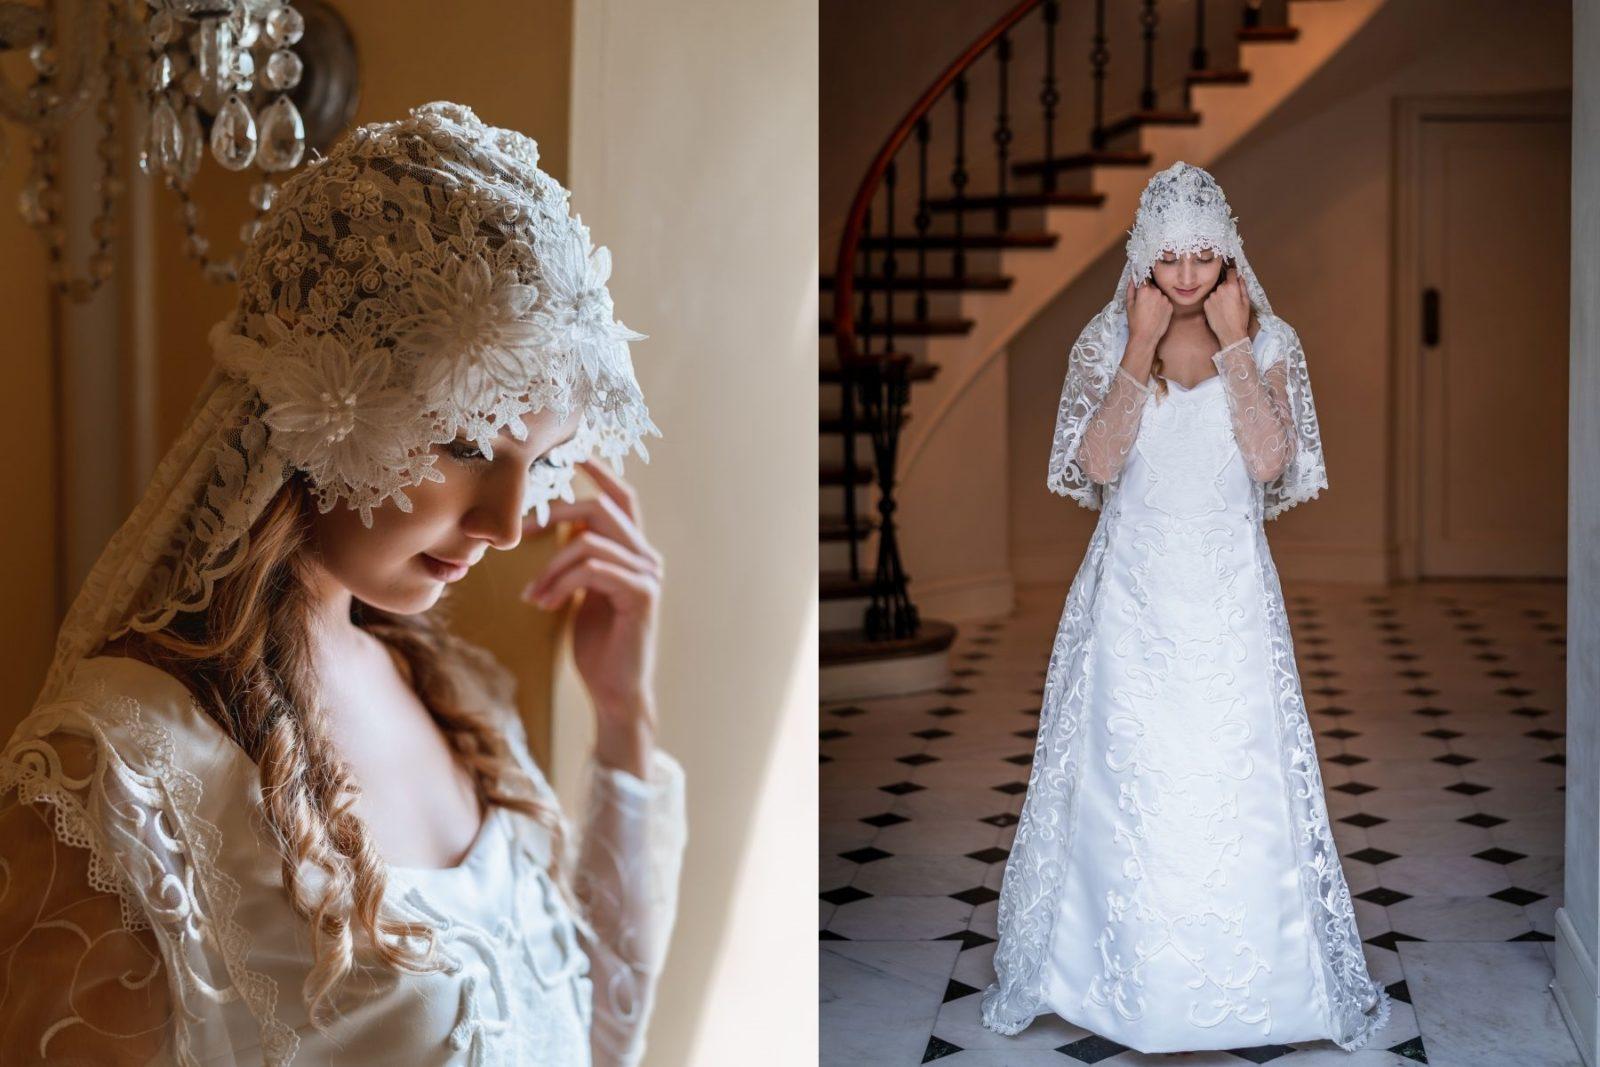 Padme' Amidala Wedding Dress Now Available